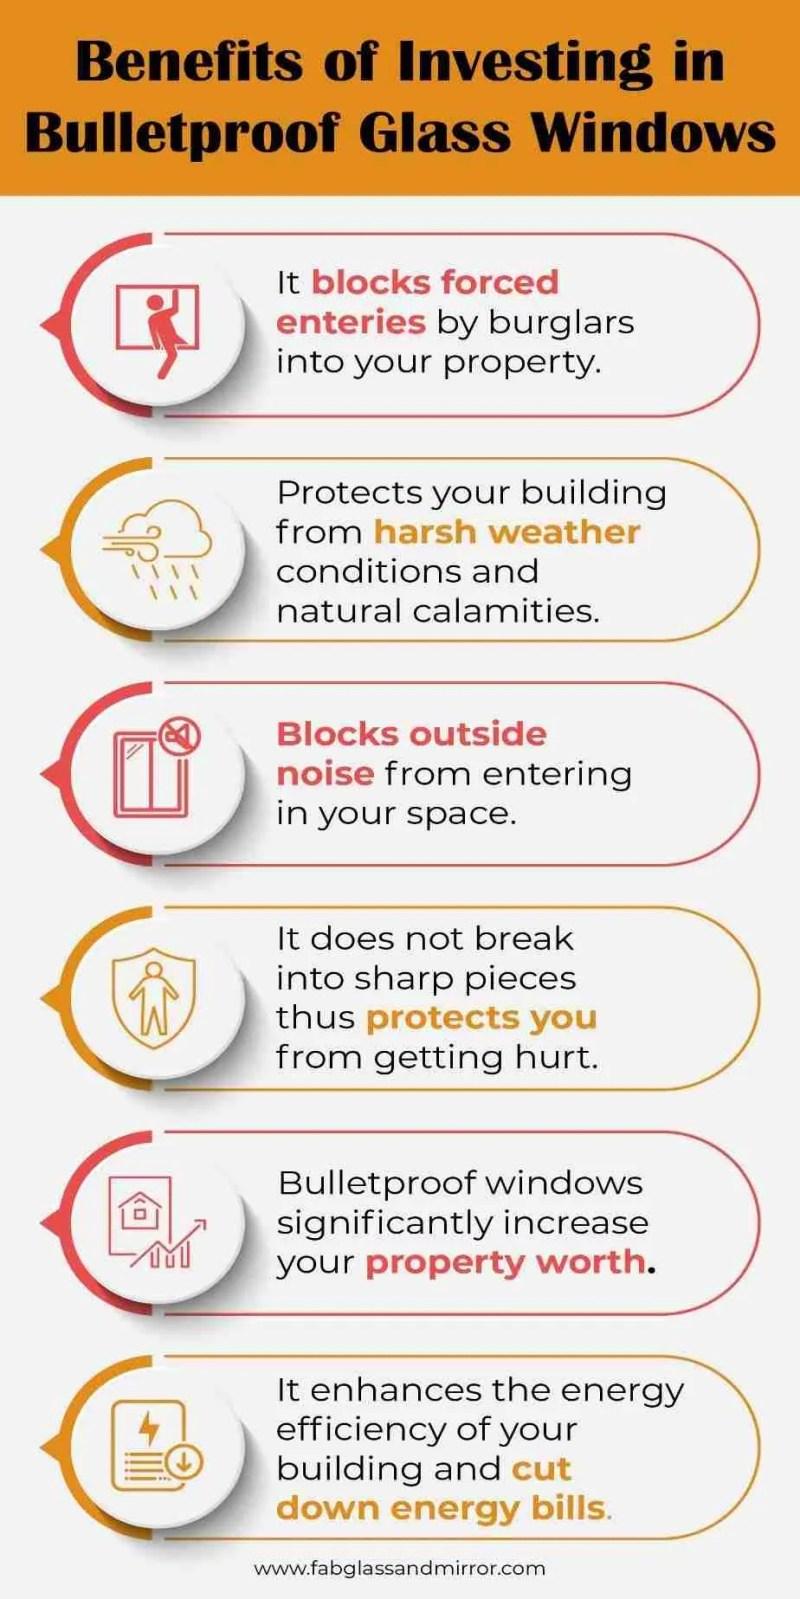 e3dr4 Bulletproof Glass Windows